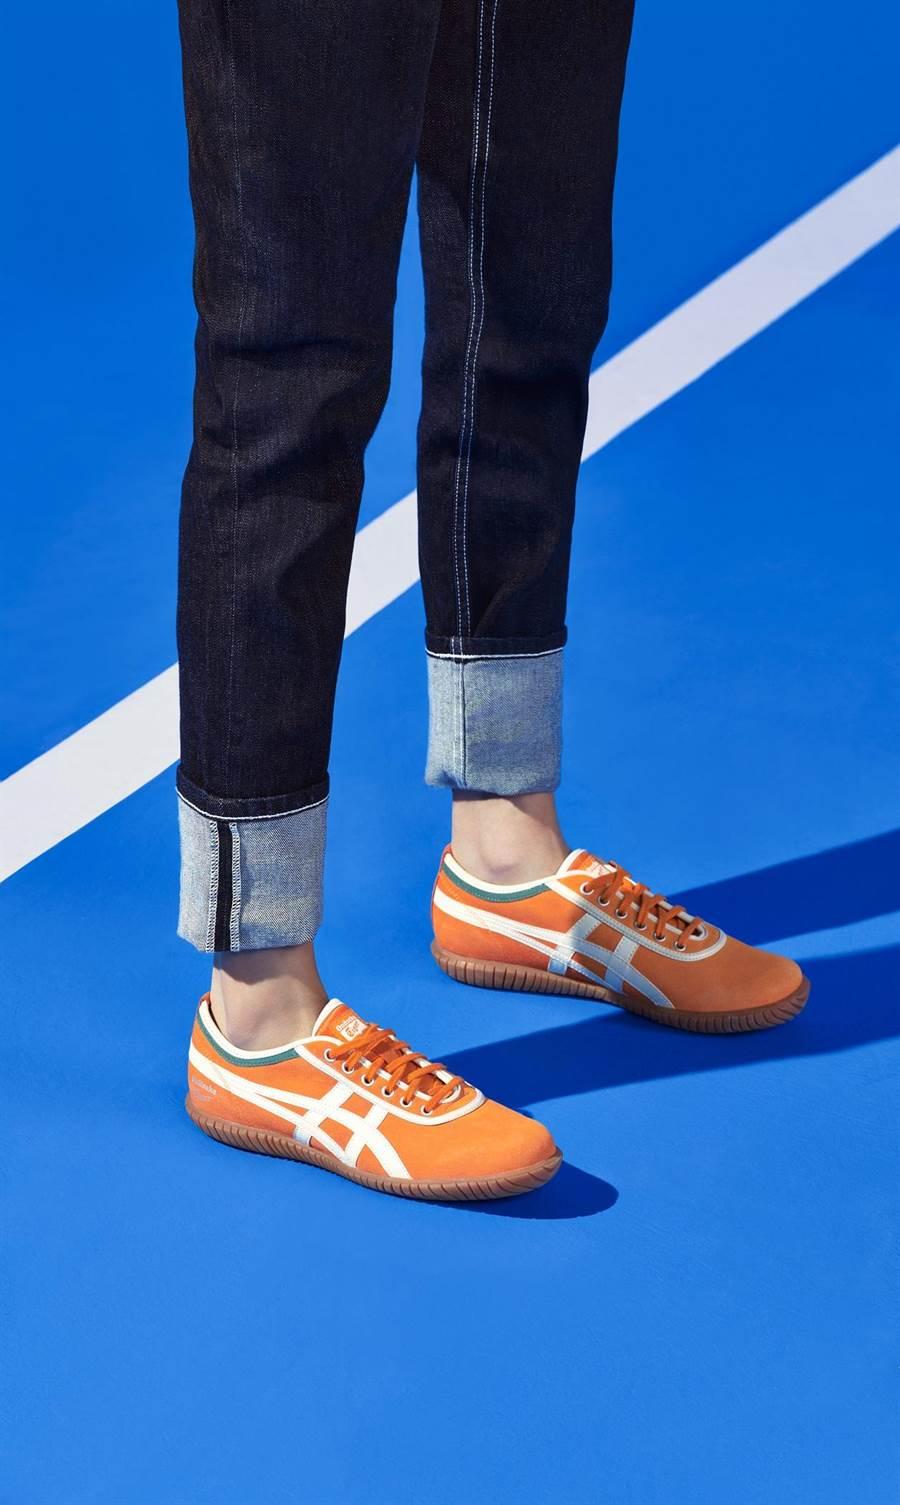 Onitsuka Tiger Tsunahiki拔河鞋系列,原汁原味的復古风潮,成为今夏瞩目焦点,2500元。(品牌提供)